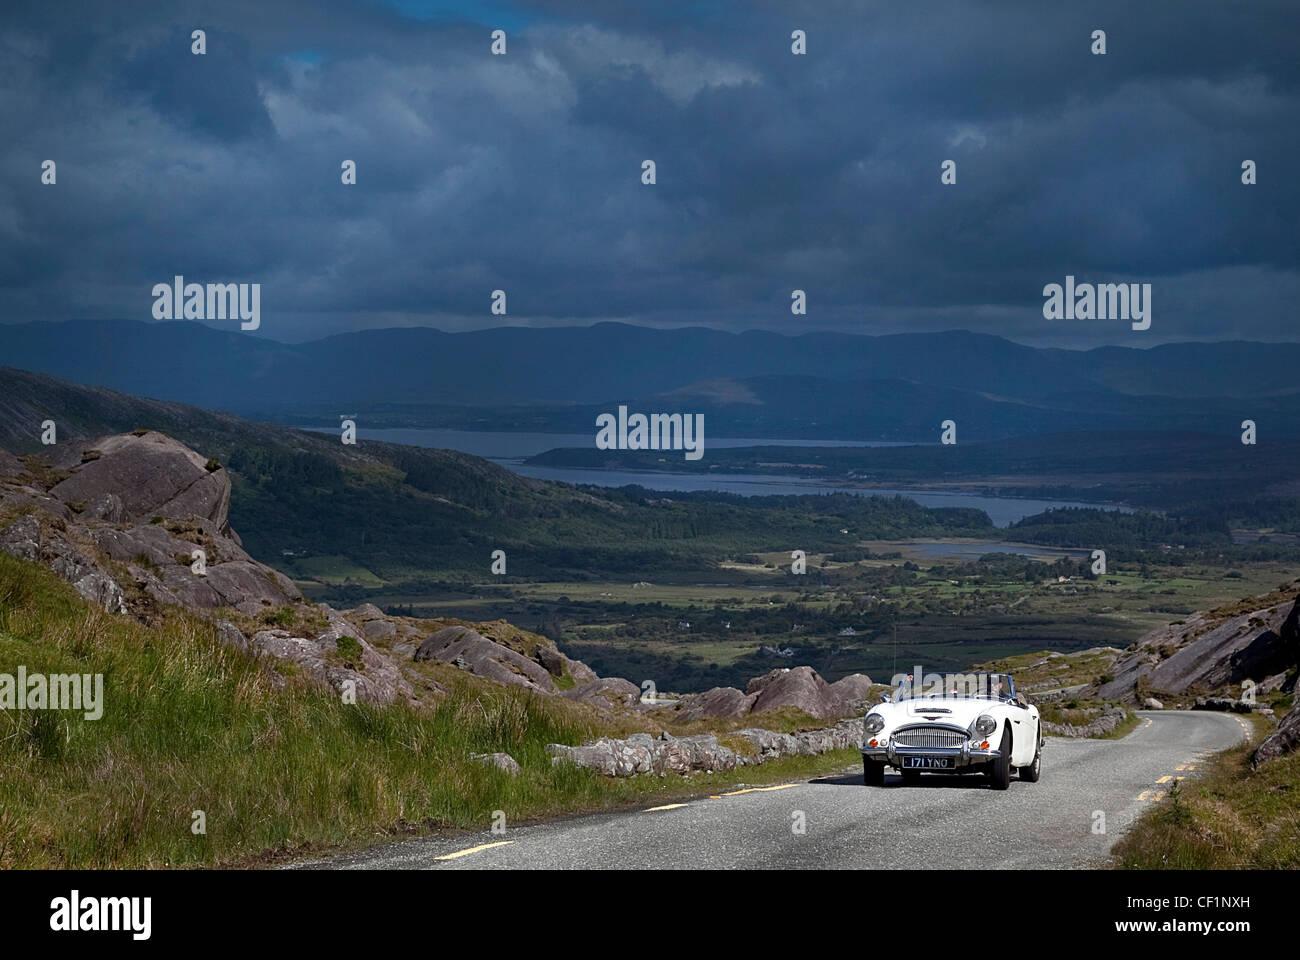 Austin Healey 3000 on the Healy Pass Co. Kerry Ireland - Stock Image